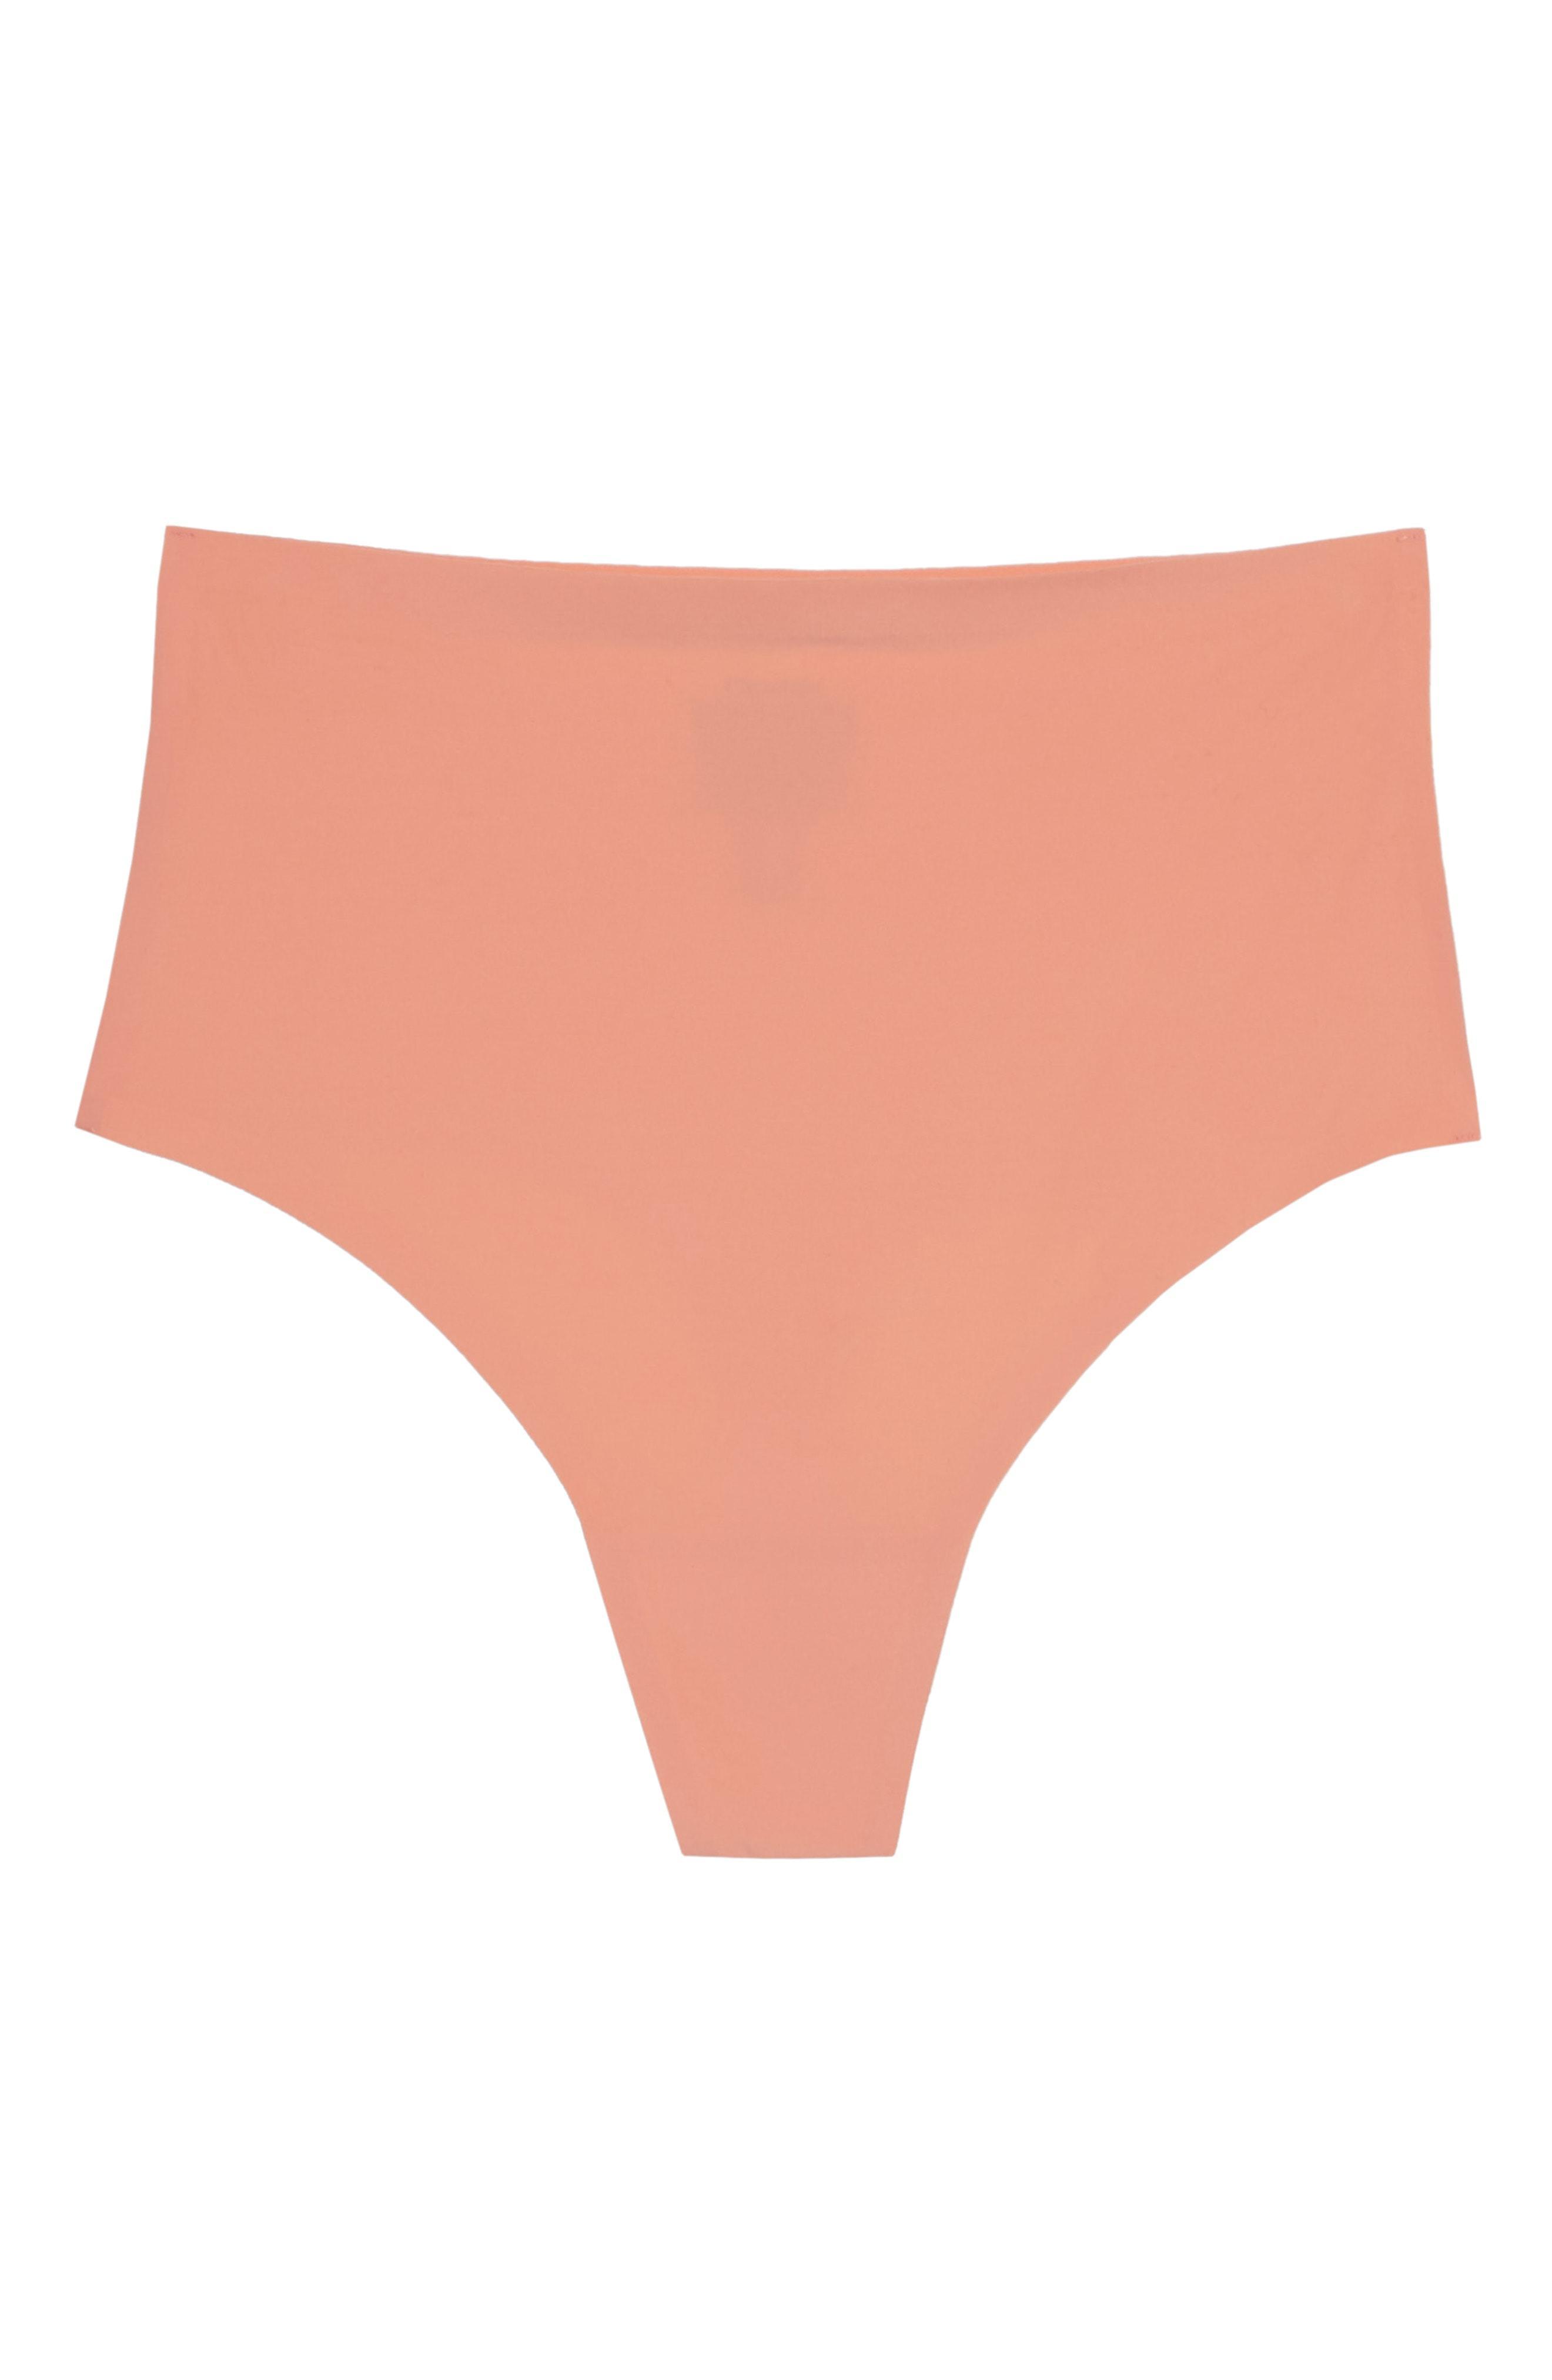 69743f1621a Chantelle. Women s Soft Stretch Seamless Retro Thong